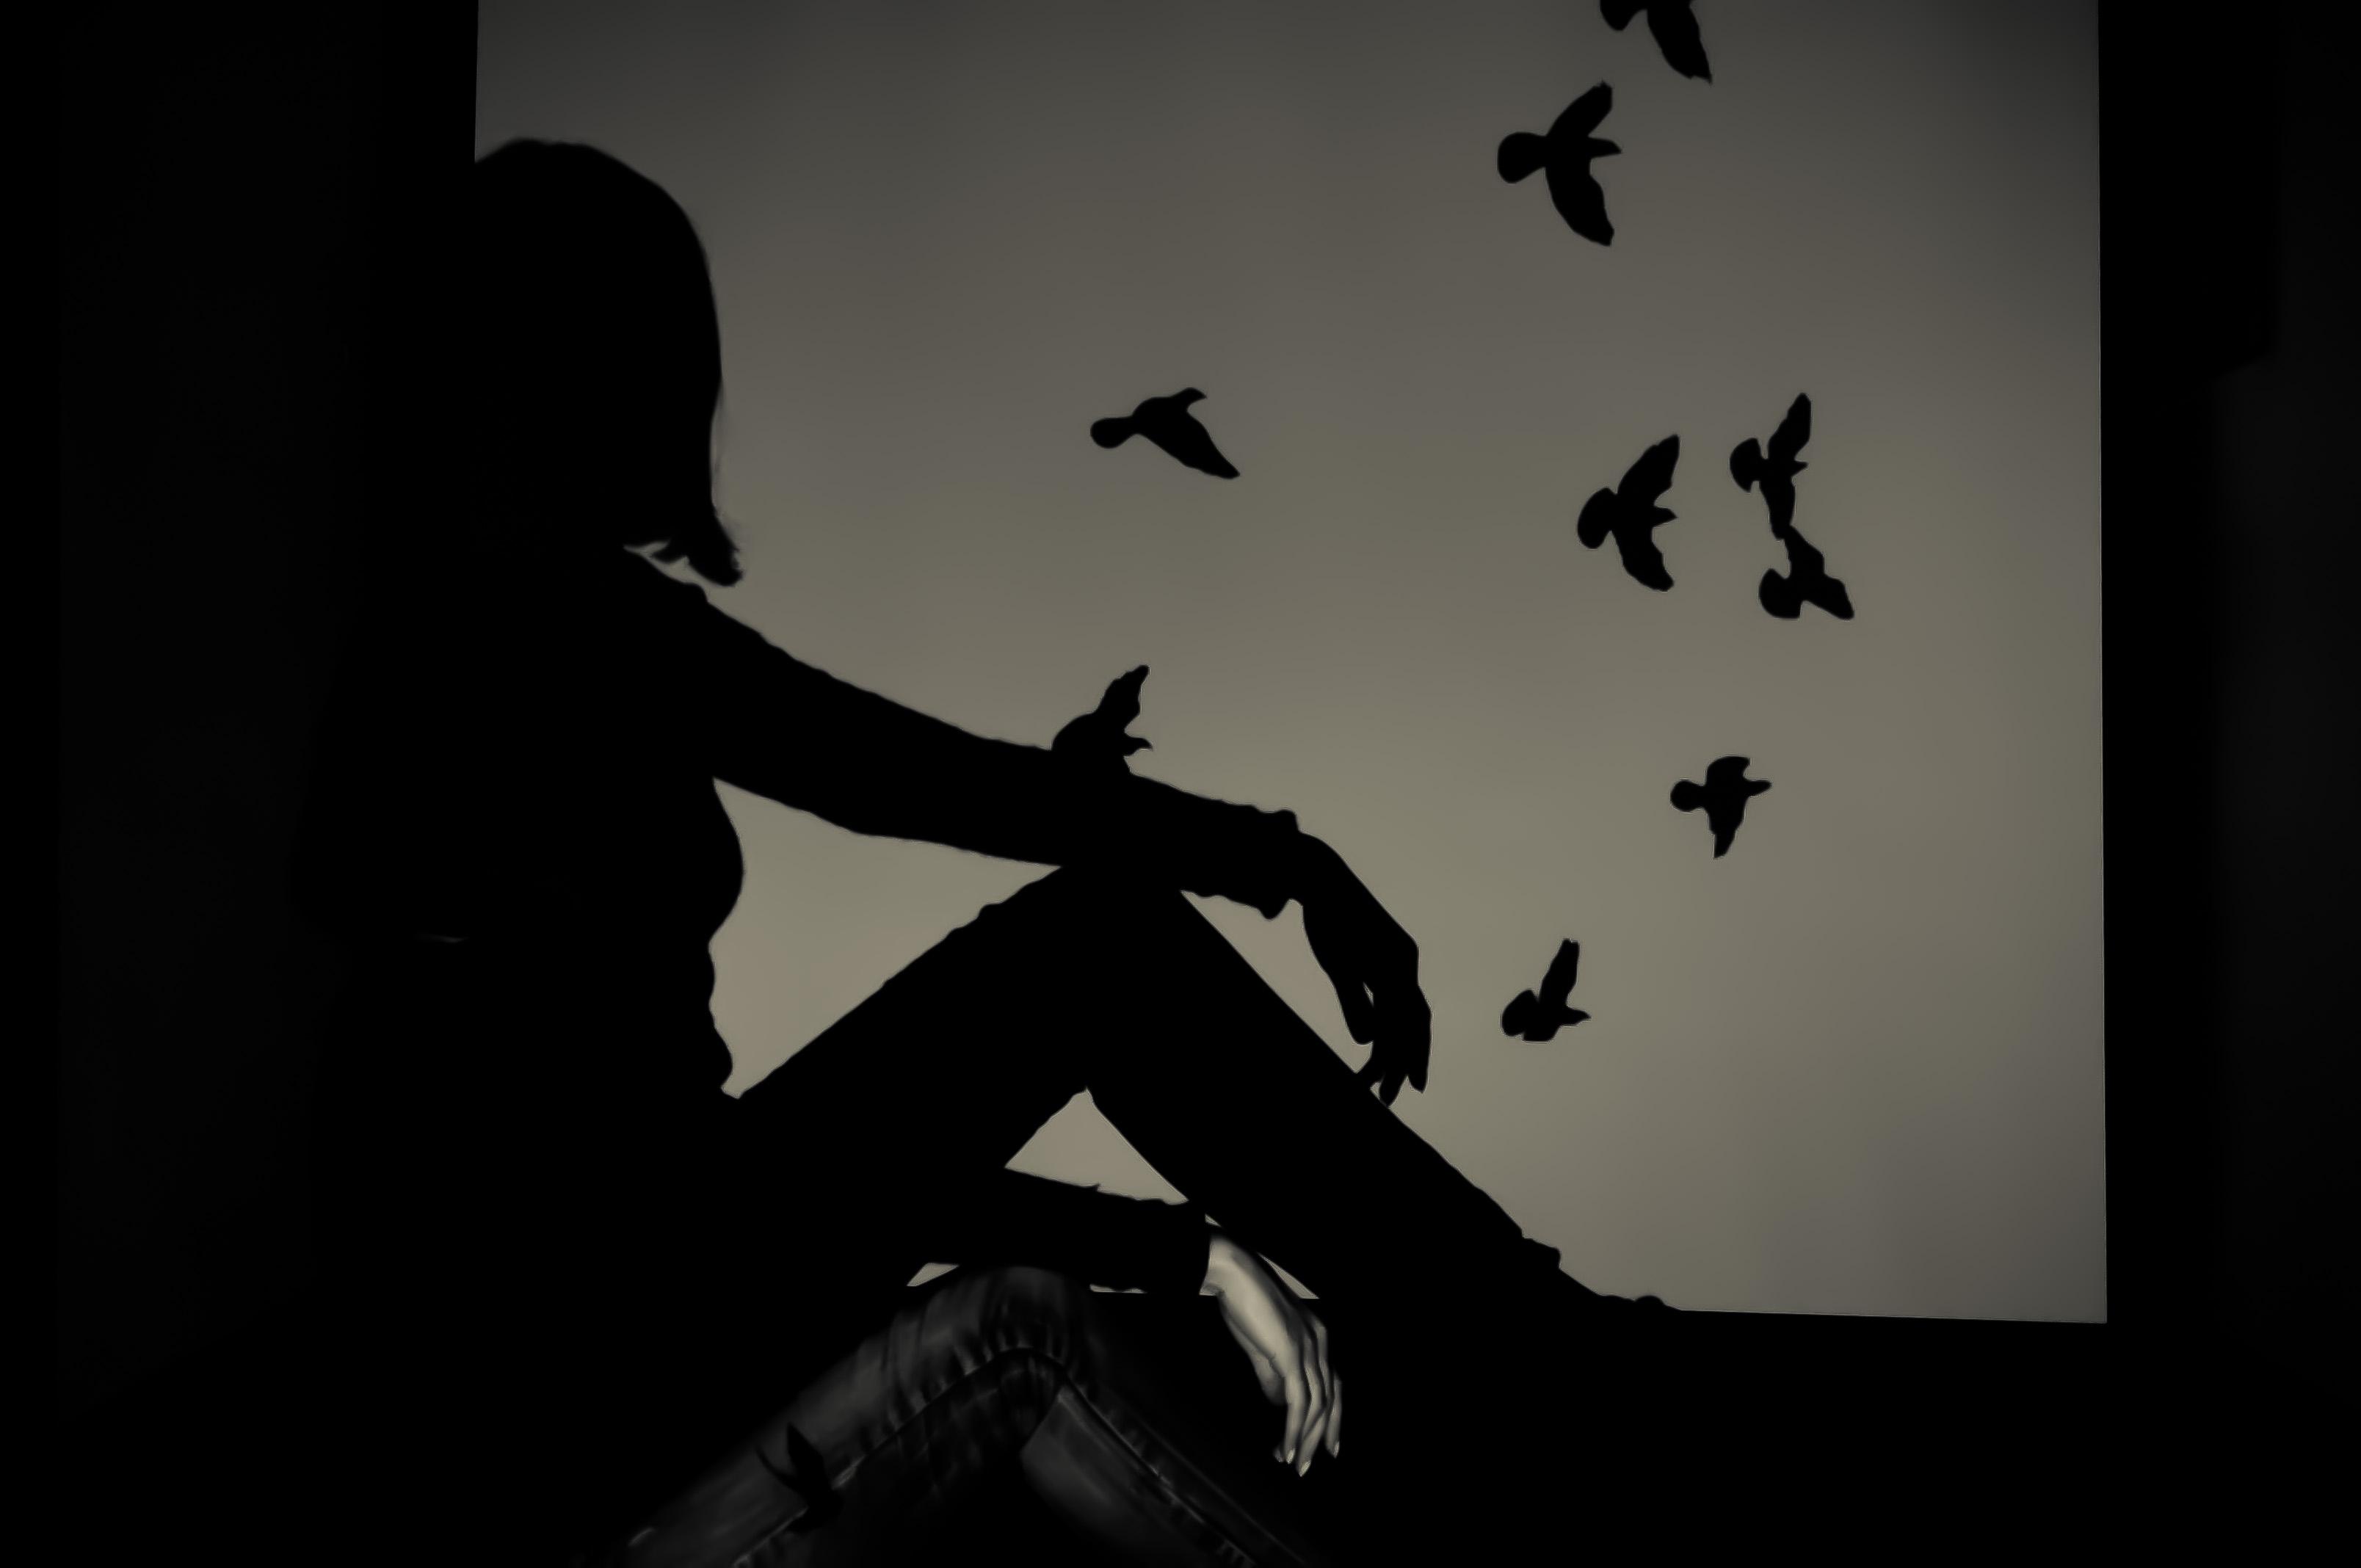 girl_birds_shadow_1.jpeg